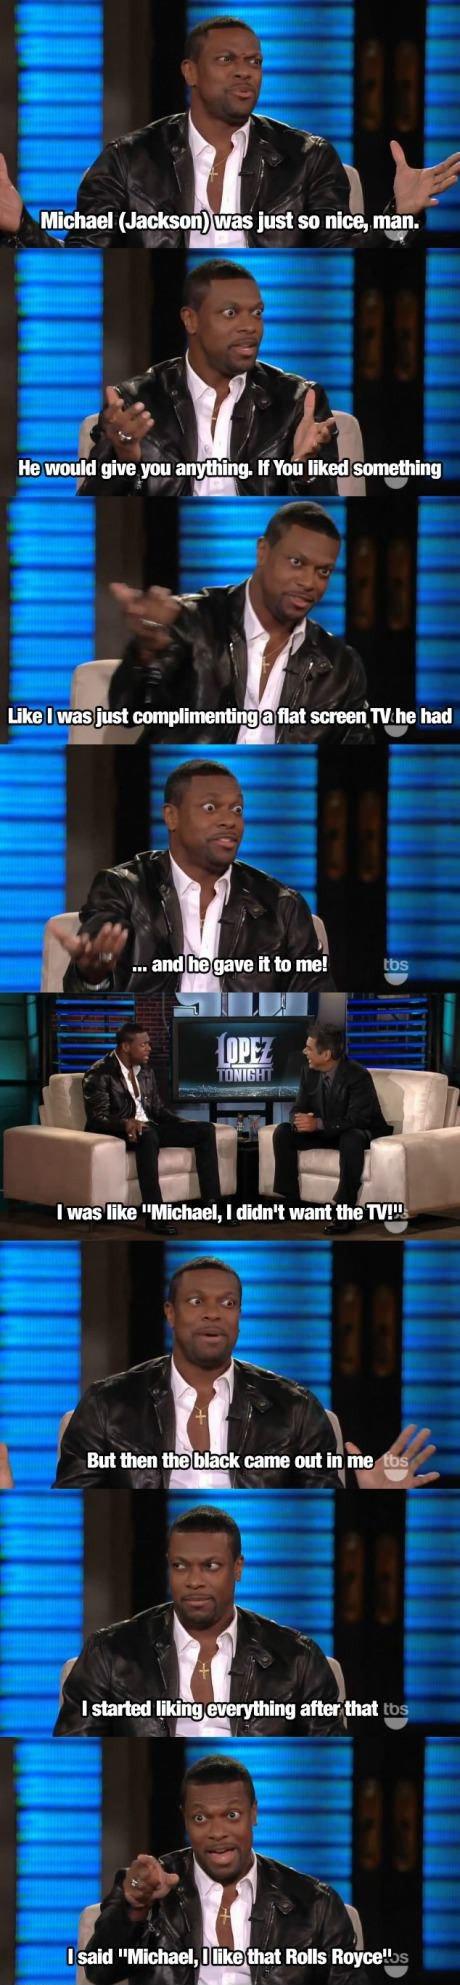 "Jackson 5. Source: Talk show. Michael (. was just SOI nice, main. He would ""if/ ts it , iraniie something Like I "" l? iust -ii' Fiat screen'_ w he had I was) li"